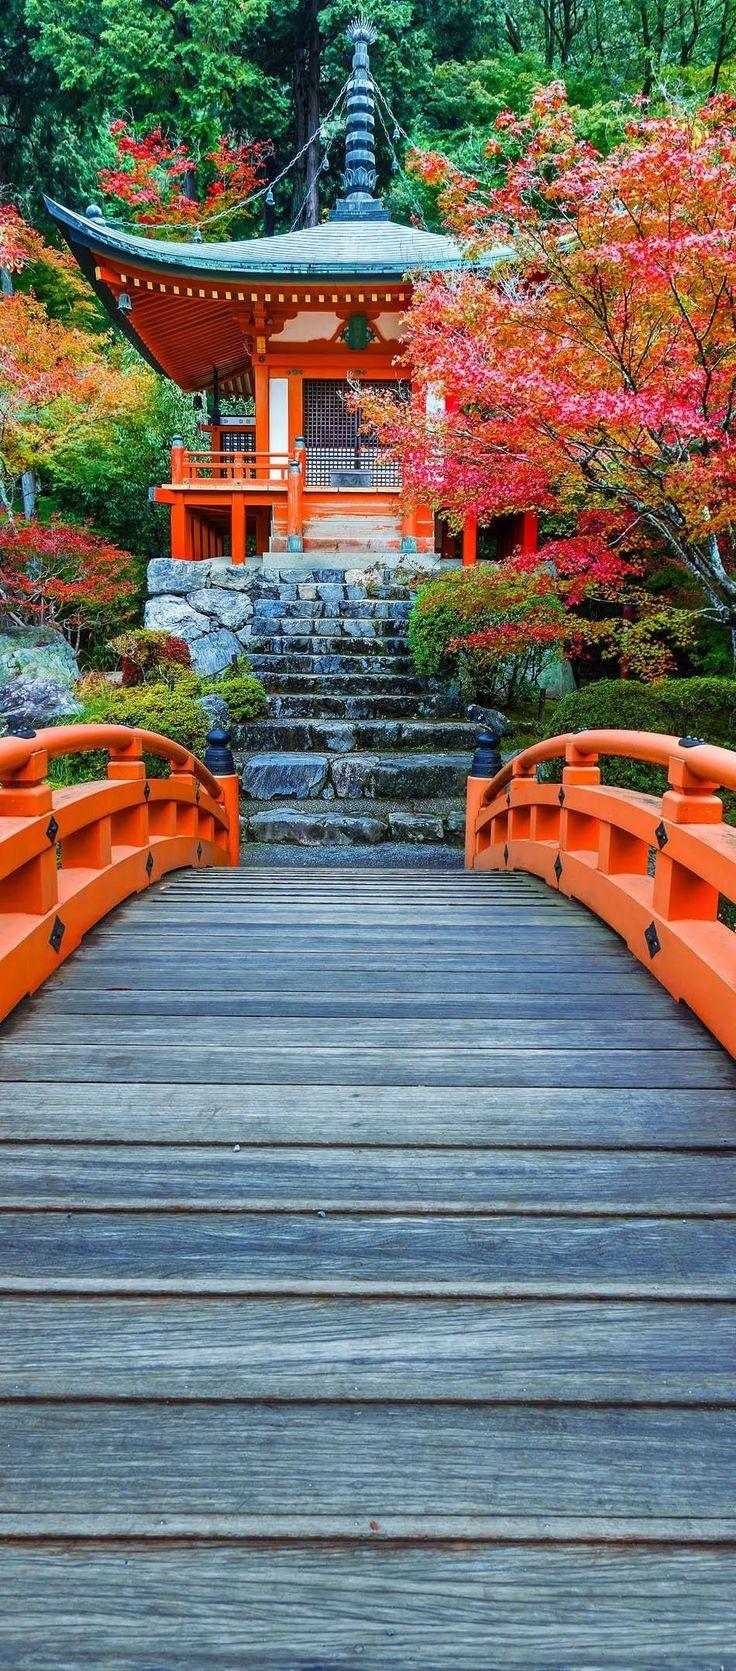 Ancient japanese gardens - 19 Reasons To Love Japanan An Unforgettable Travel Destination Japanese Gardenstravel